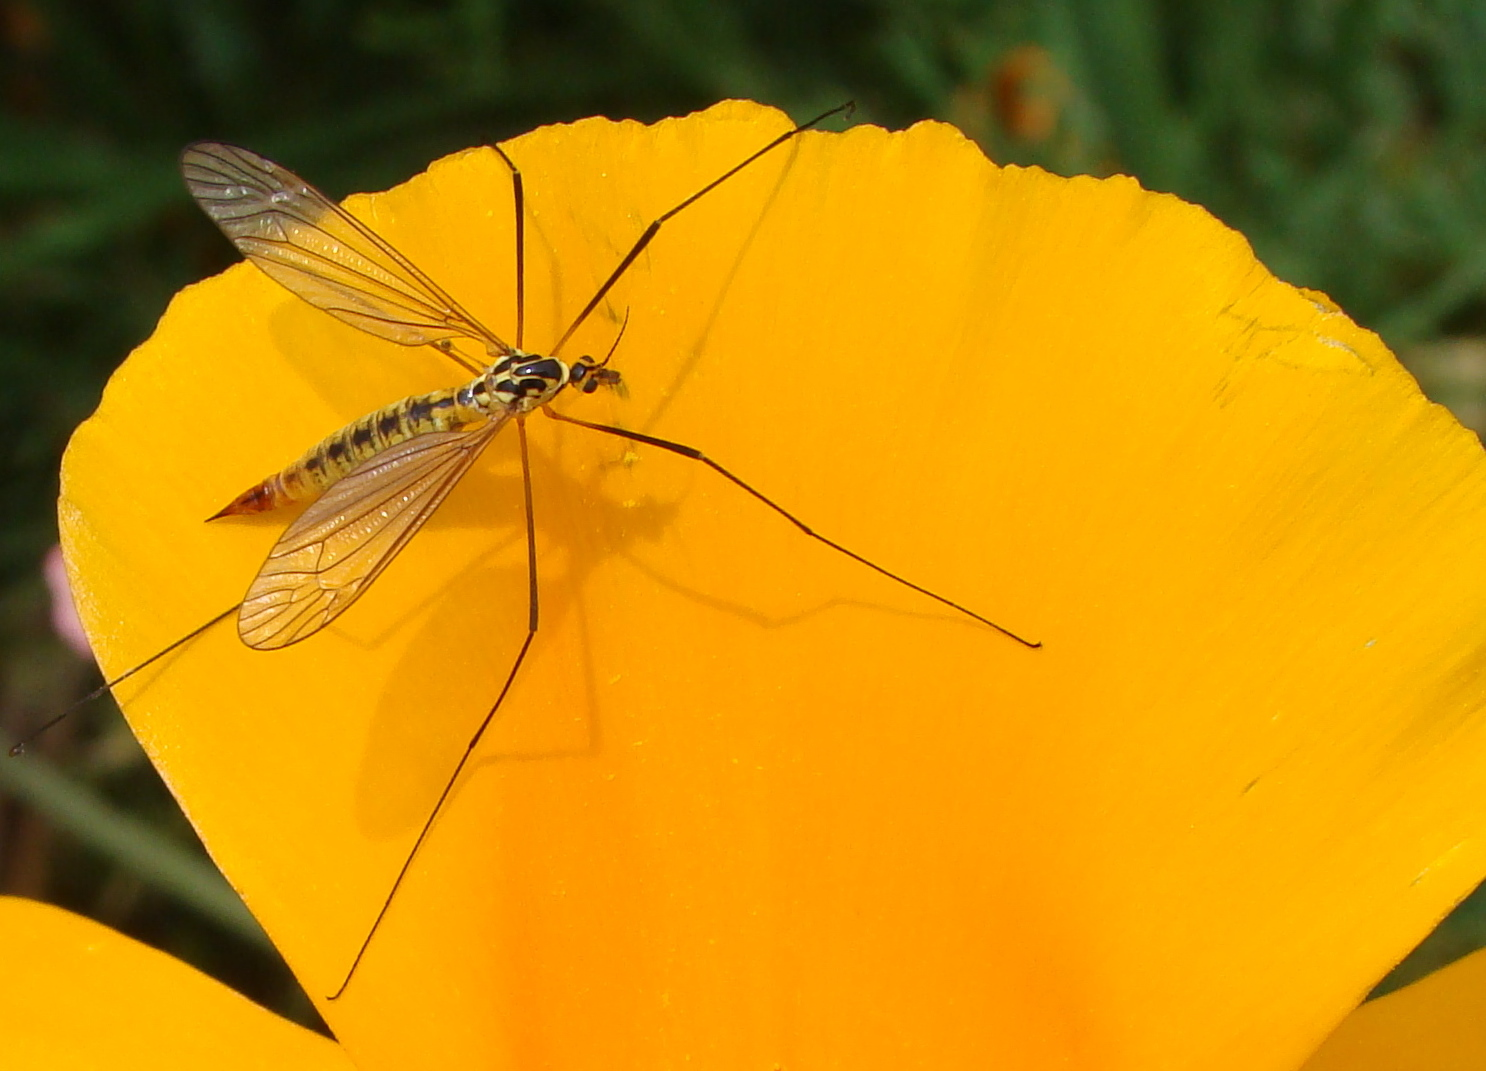 Un cousin qui déguste du nectar...